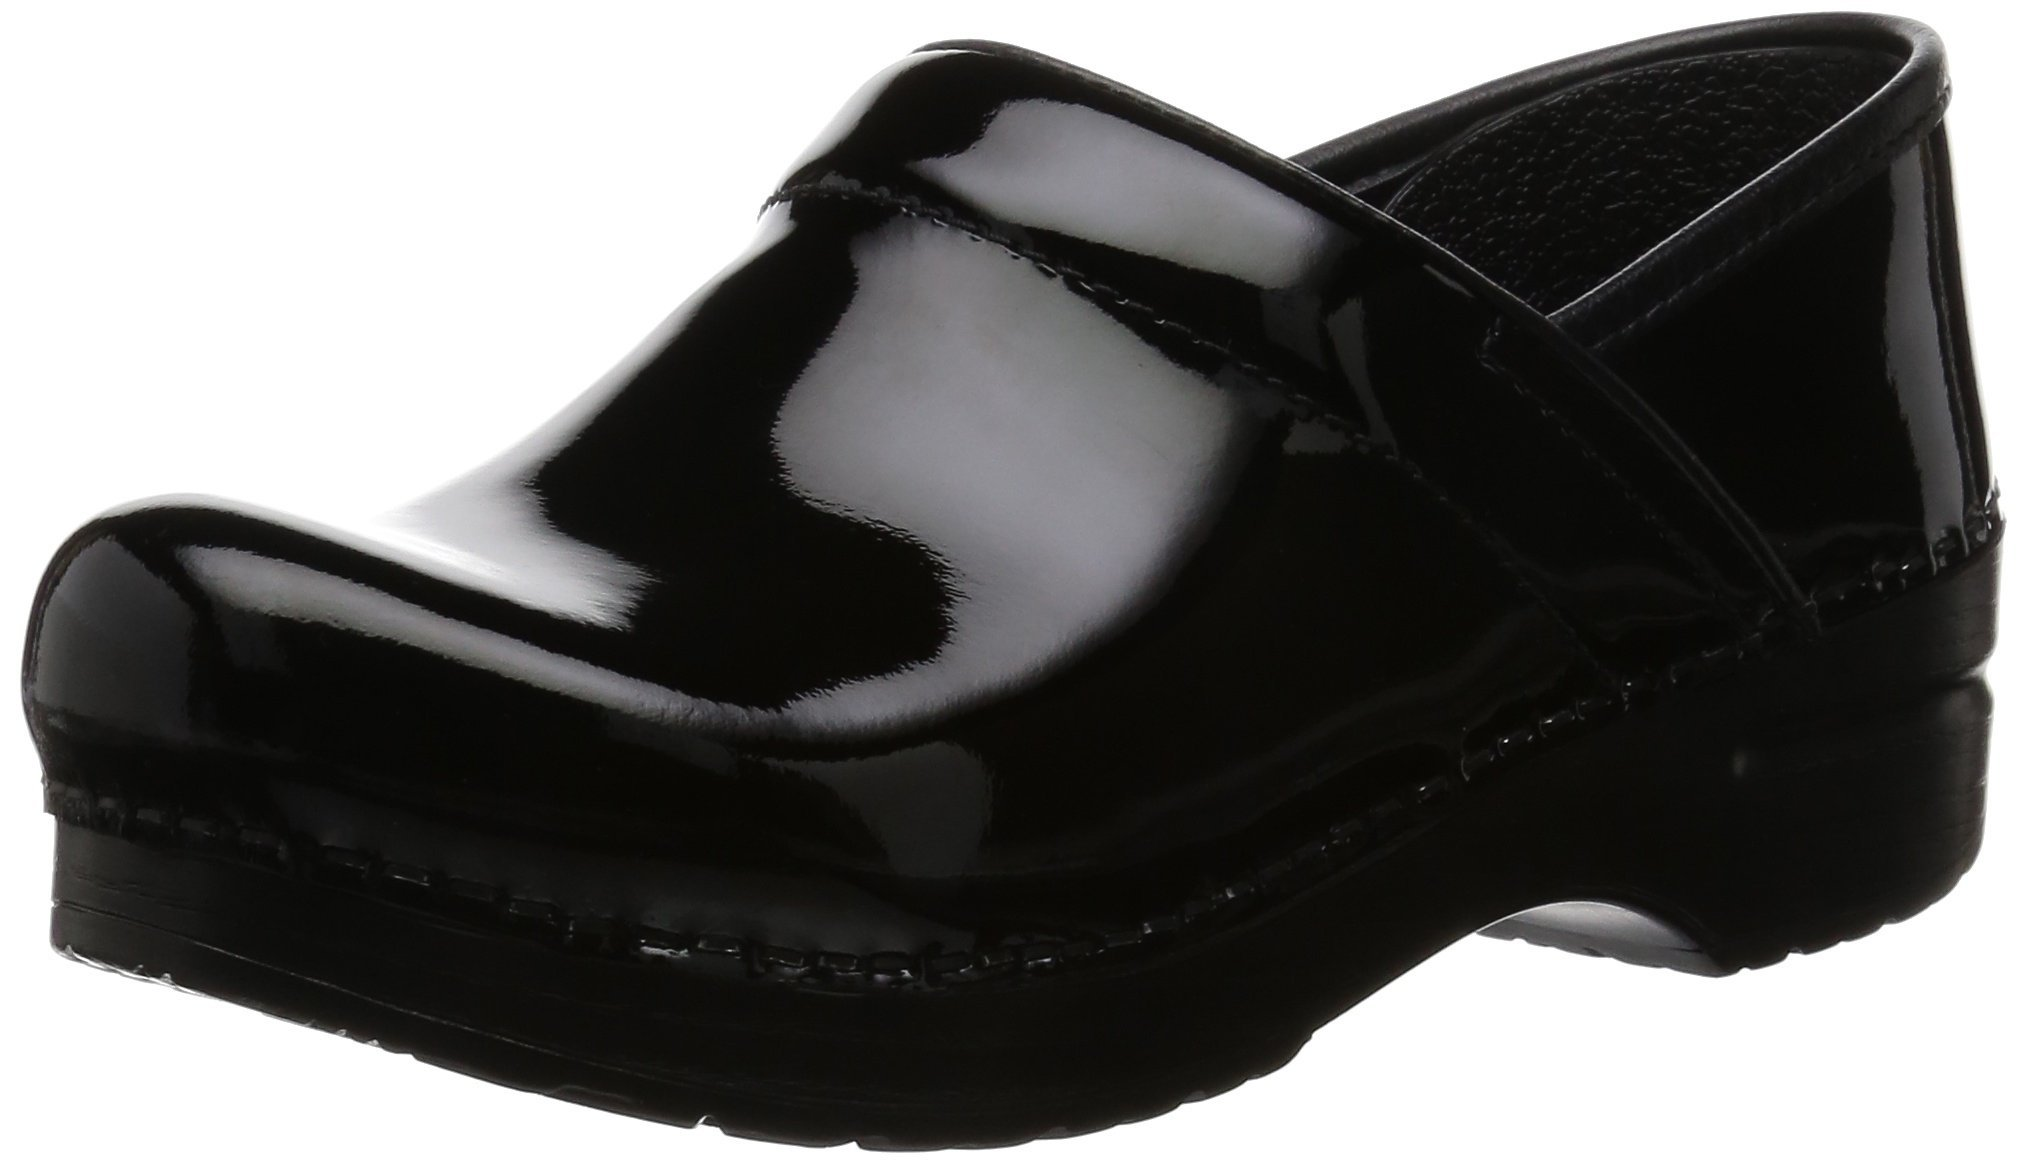 Dansko Women's Professional Patent Leather Clog,Black Patent,39 EU / 8.5-9 M US by Dansko